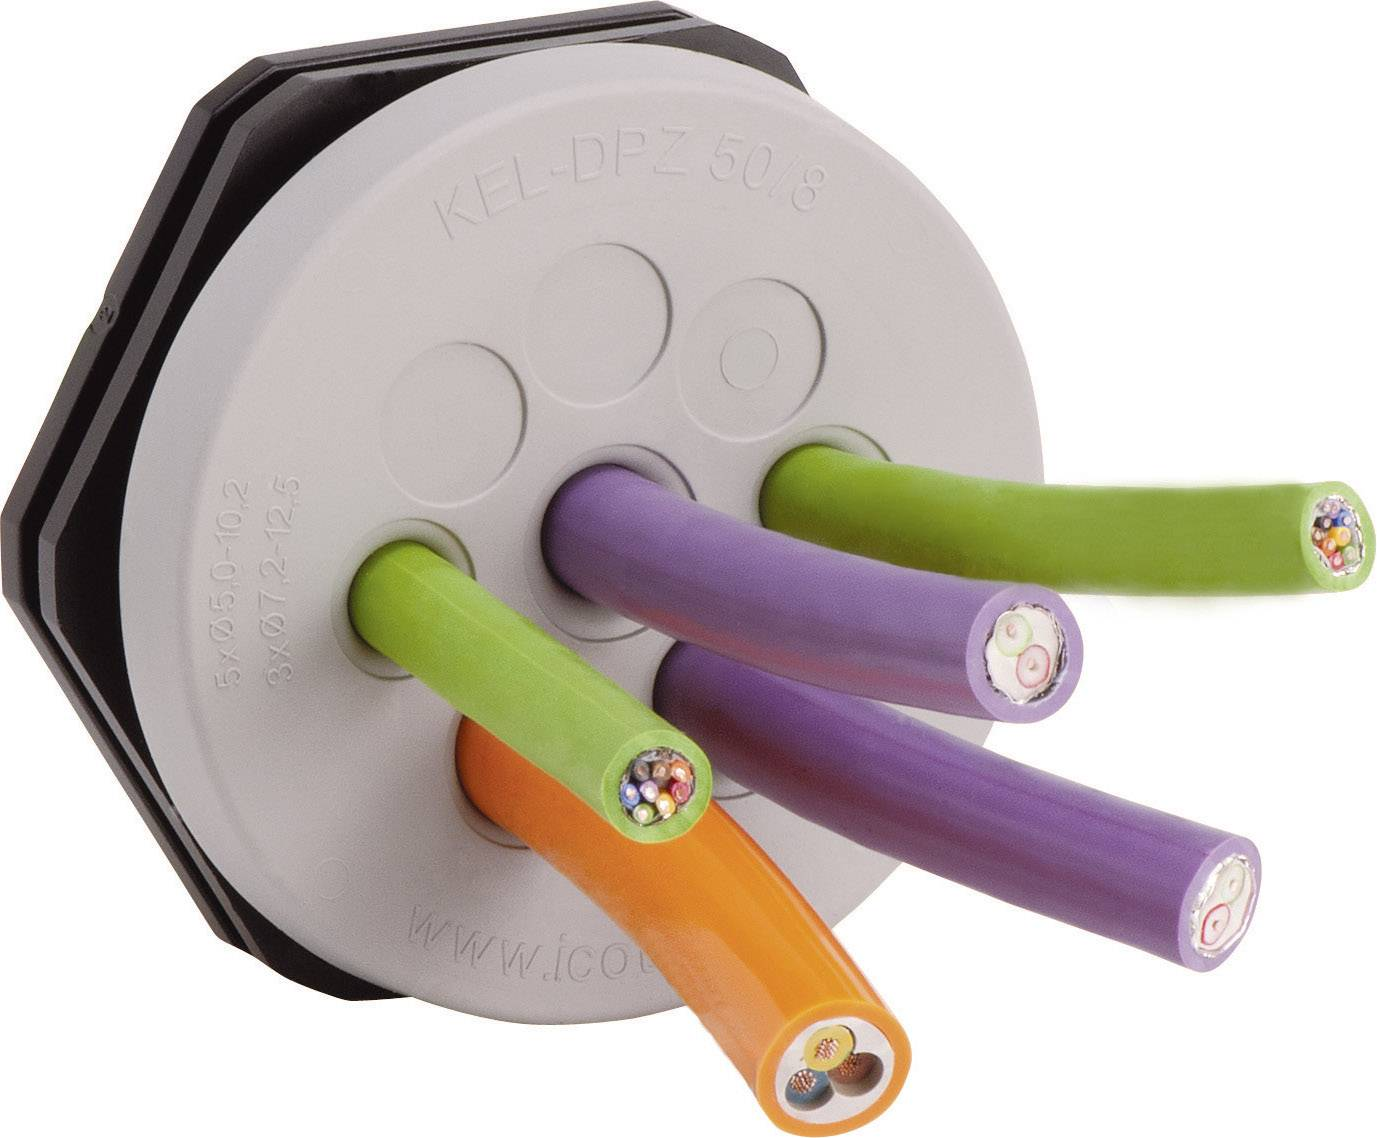 Icotek Uvodnica za kable KEL-DPZ okrogla KEL-DPZ 63|35 velikost: M63 poliamid/elastomer, siva